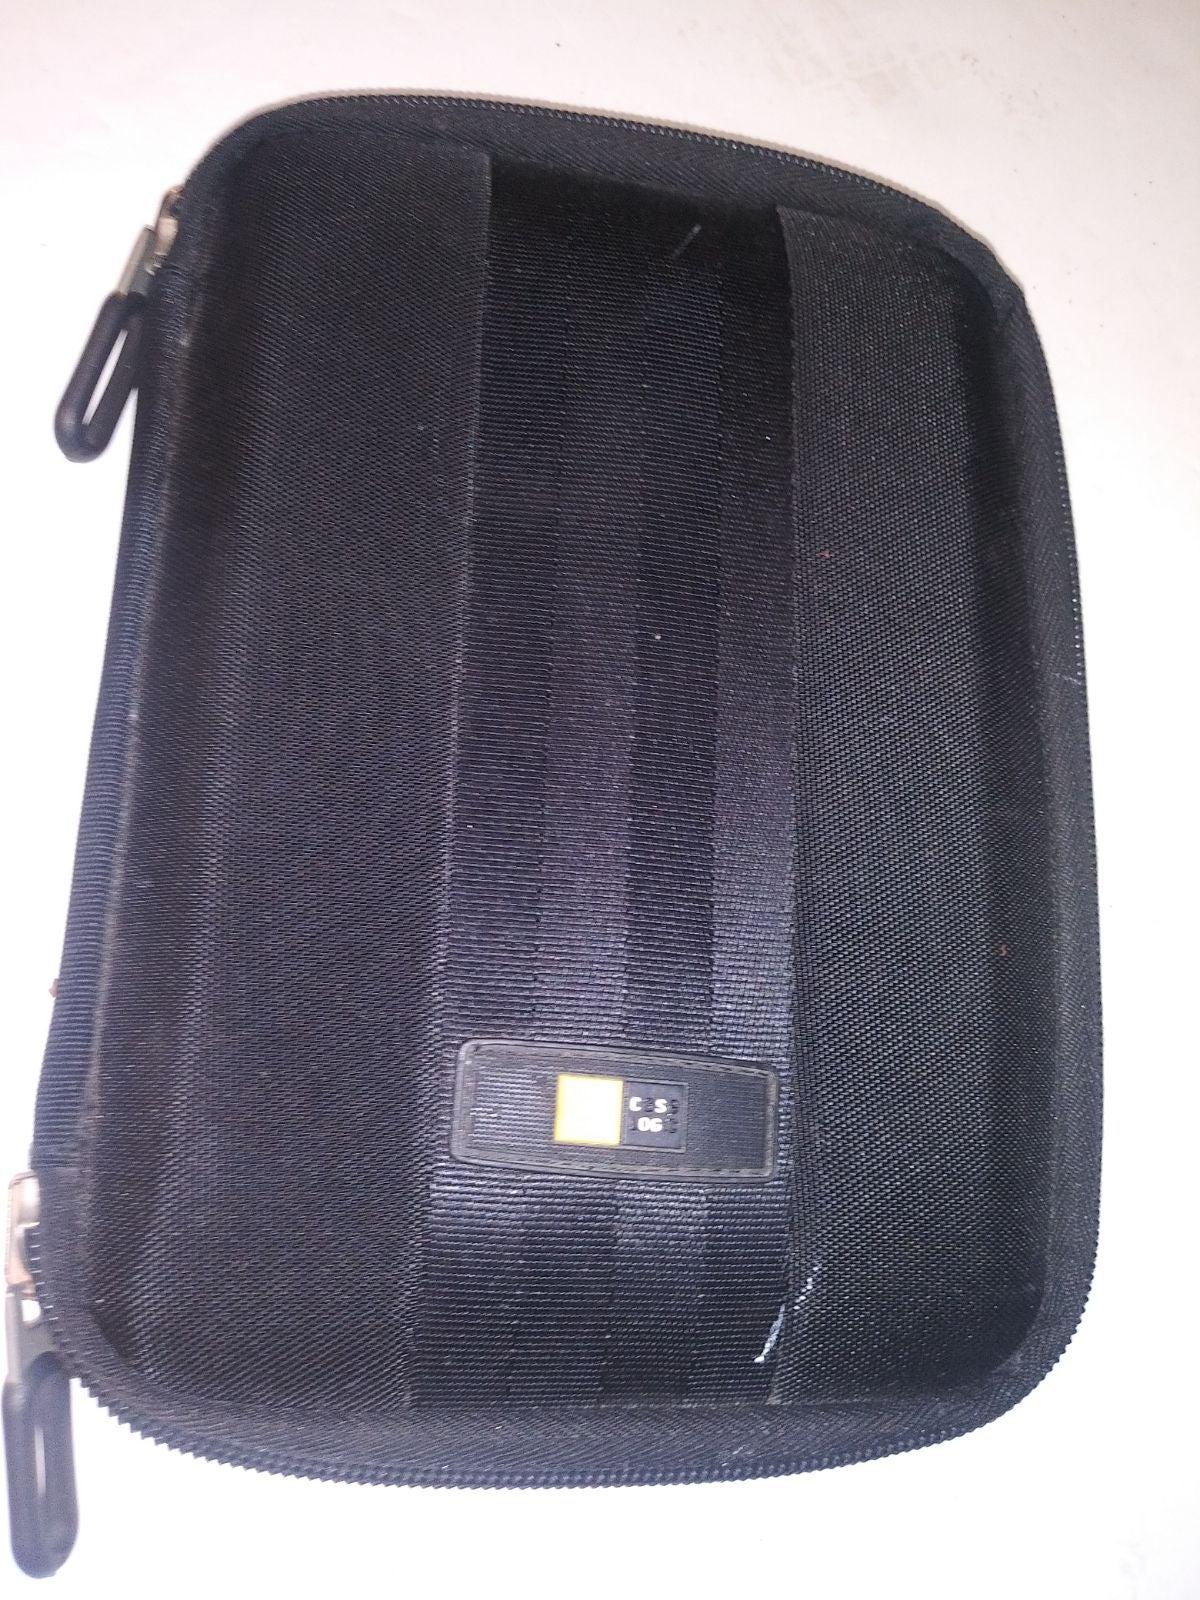 Case logic small tablet case holder good